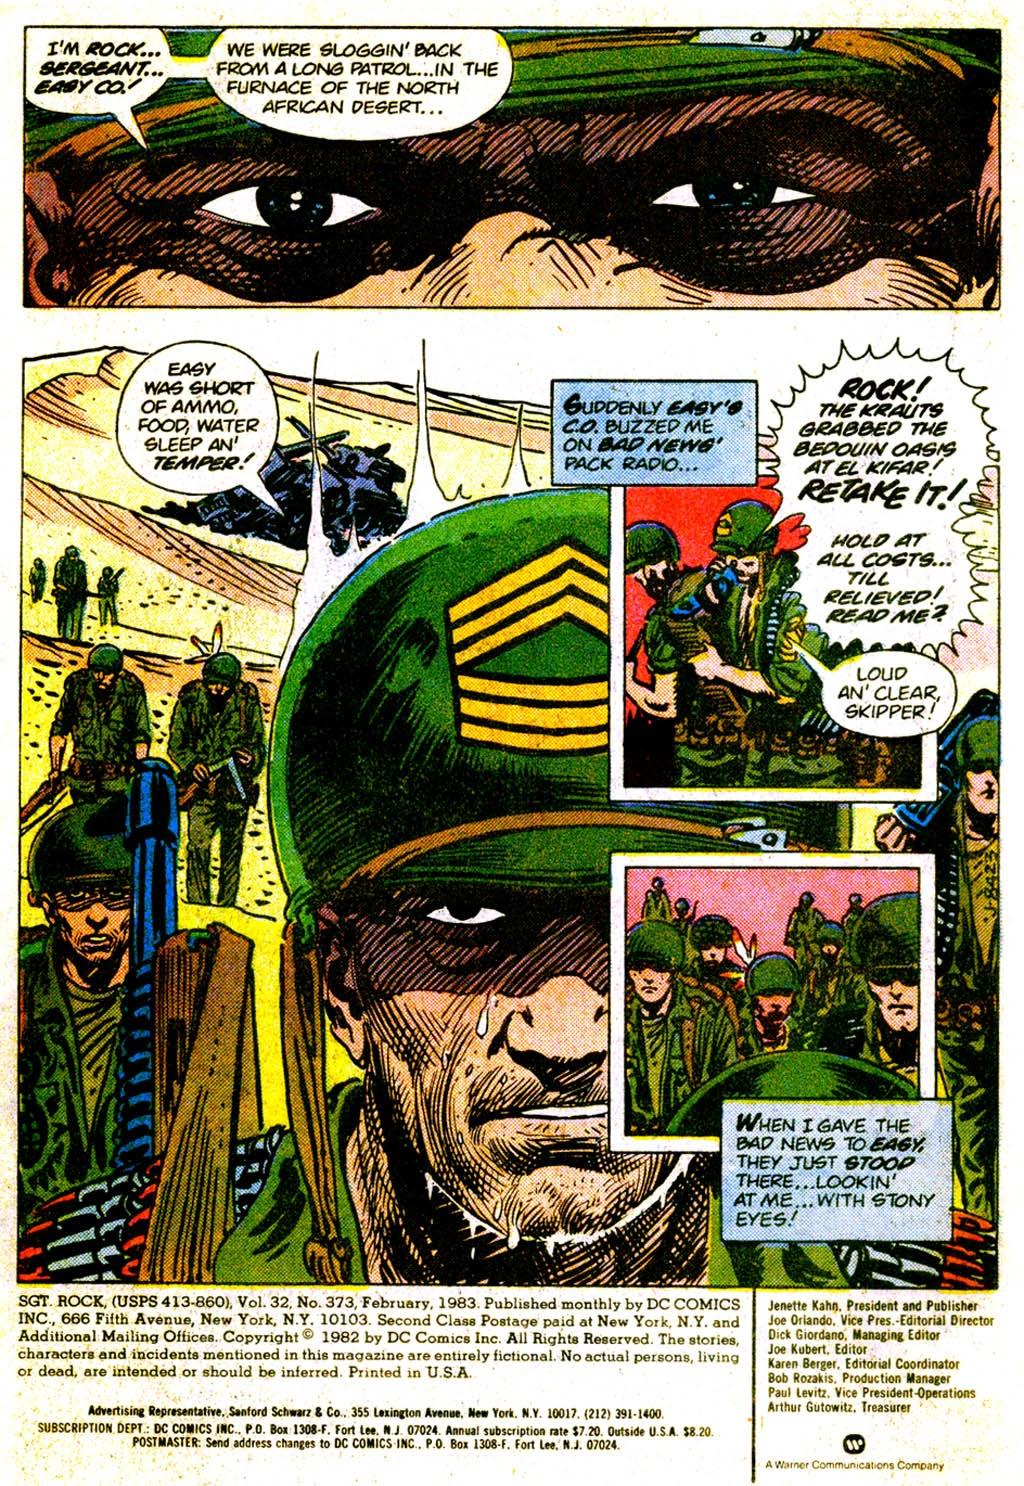 Read online Sgt. Rock comic -  Issue #373 - 3